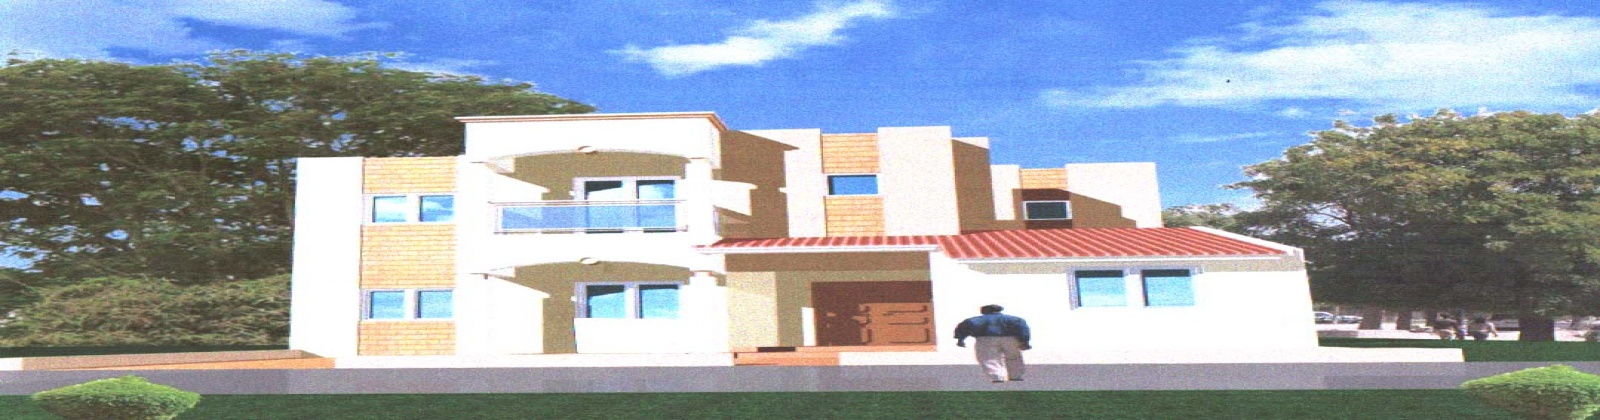 Thiaroye Azur,Dakar,4 Chambres Chambres,Villa,1025